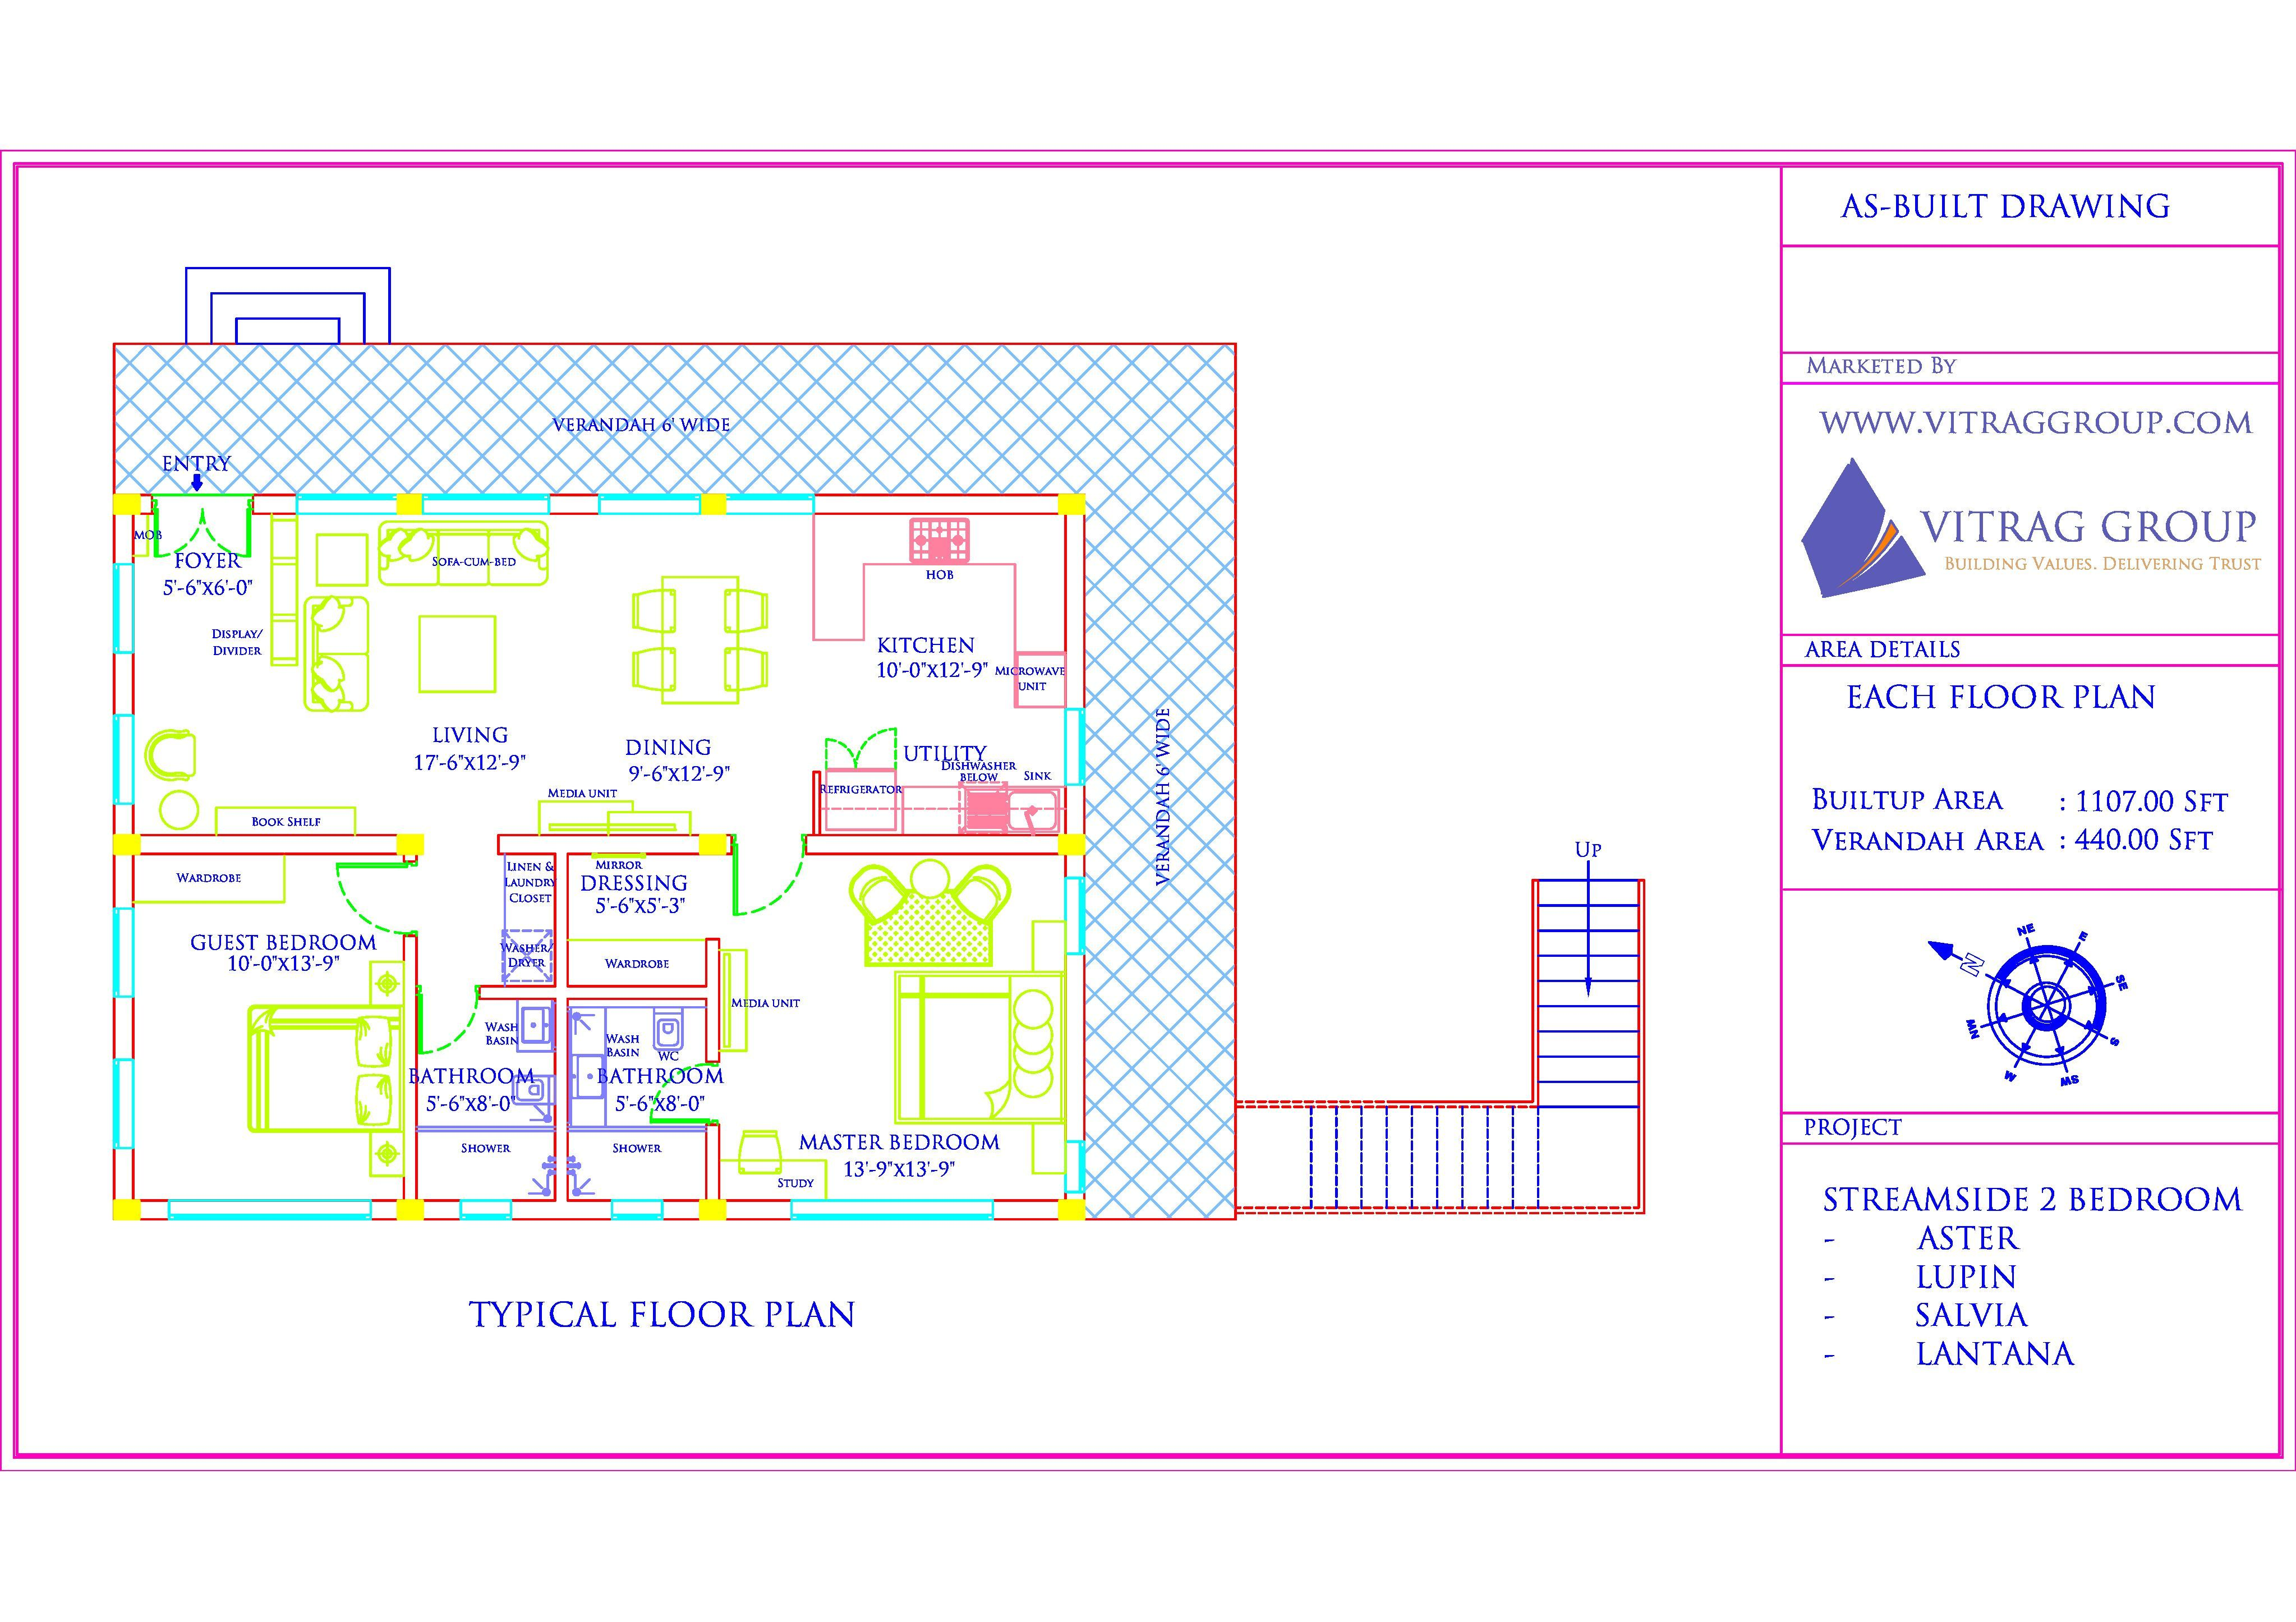 Typical Internal Floor Plan